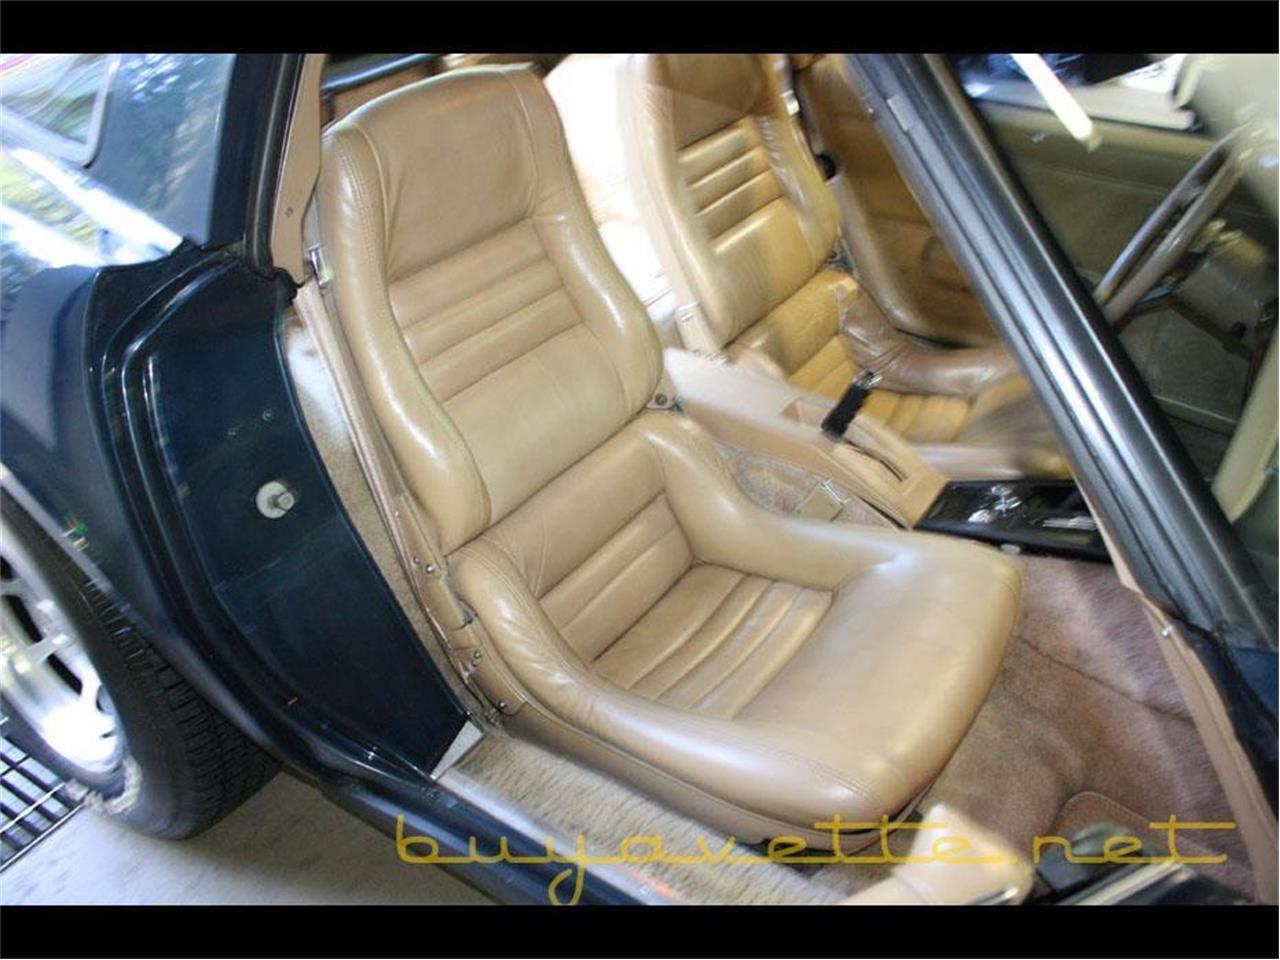 Large Picture of '81 Chevrolet Corvette located in Georgia - $13,999.00 - L3DP